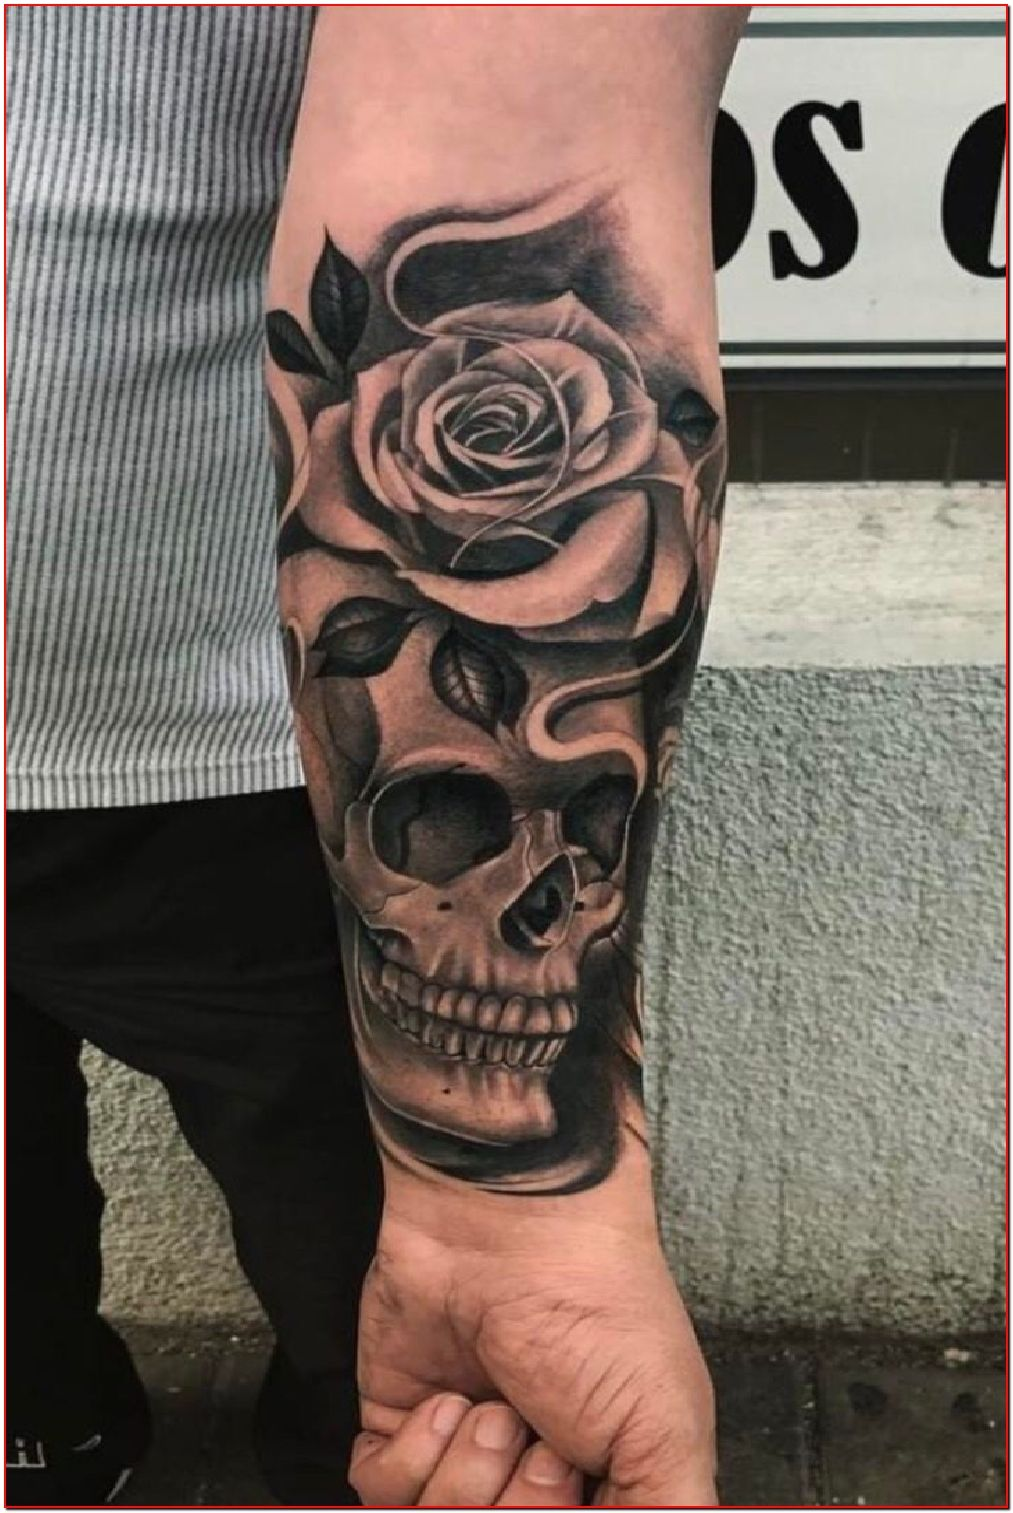 Tattoo Ideas For Men Arm 12 Tattoo In 2020 Arm Tattoos For Guys Skull Sleeve Tattoos Tattoo Designs Men